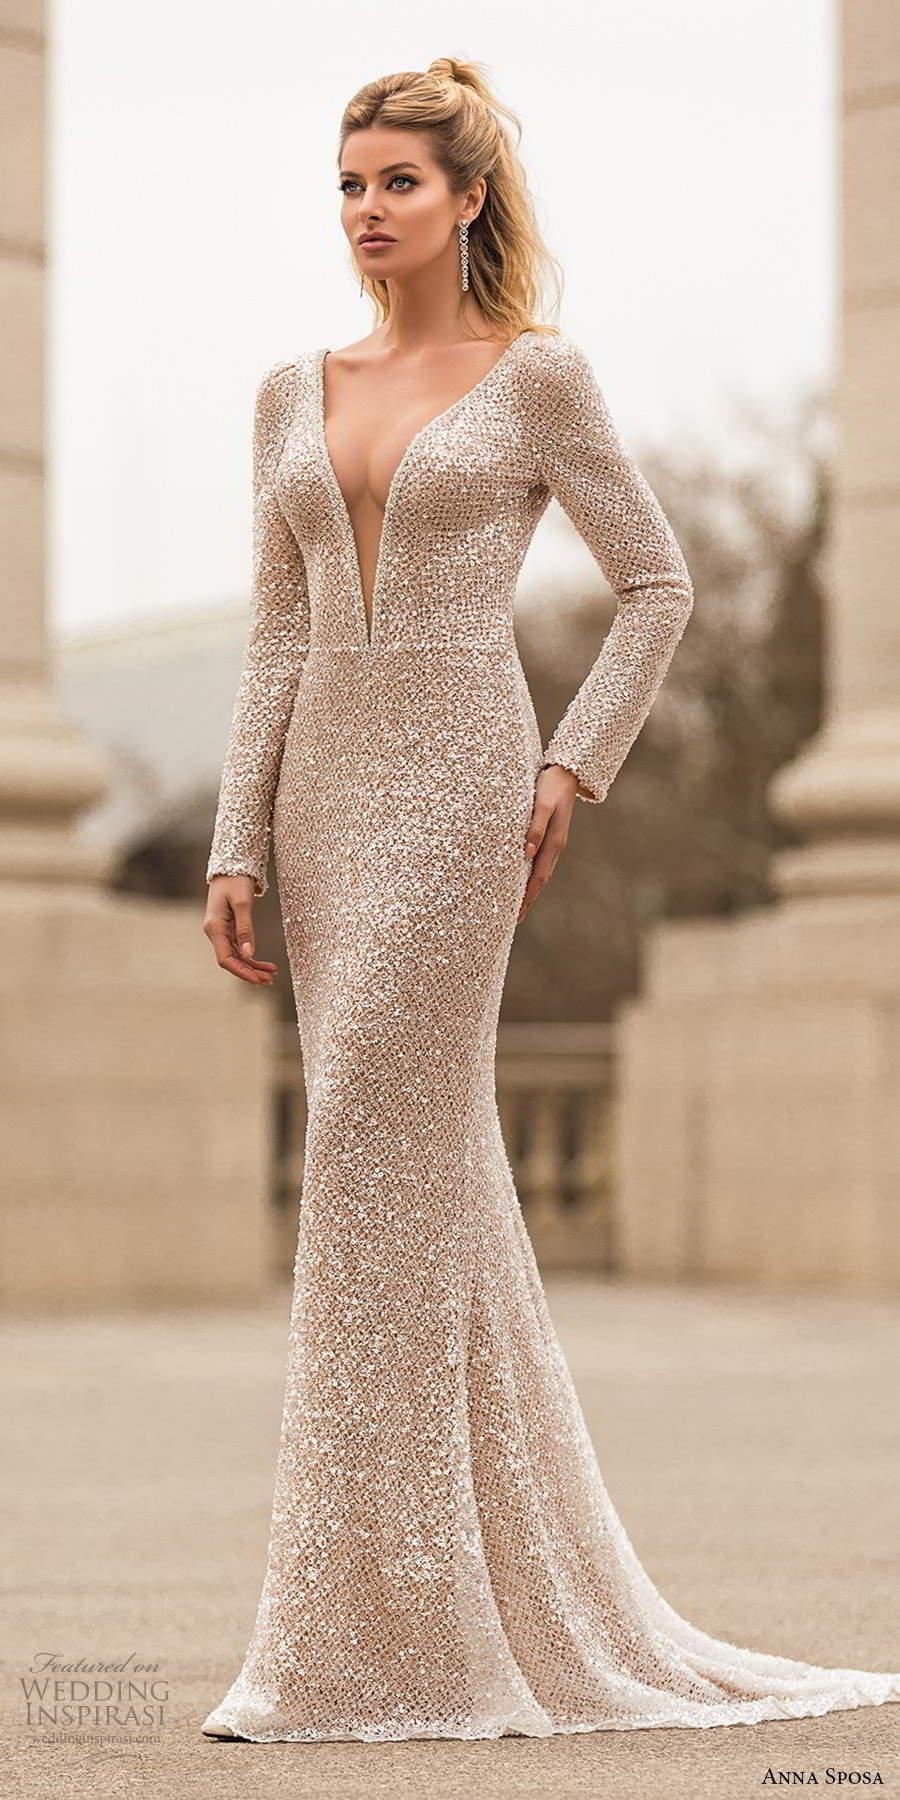 anna sposa 2021 bridal long sleeves plunging v neckline fully embellished sheath wedding dress metallic glam chapel train (12) mv